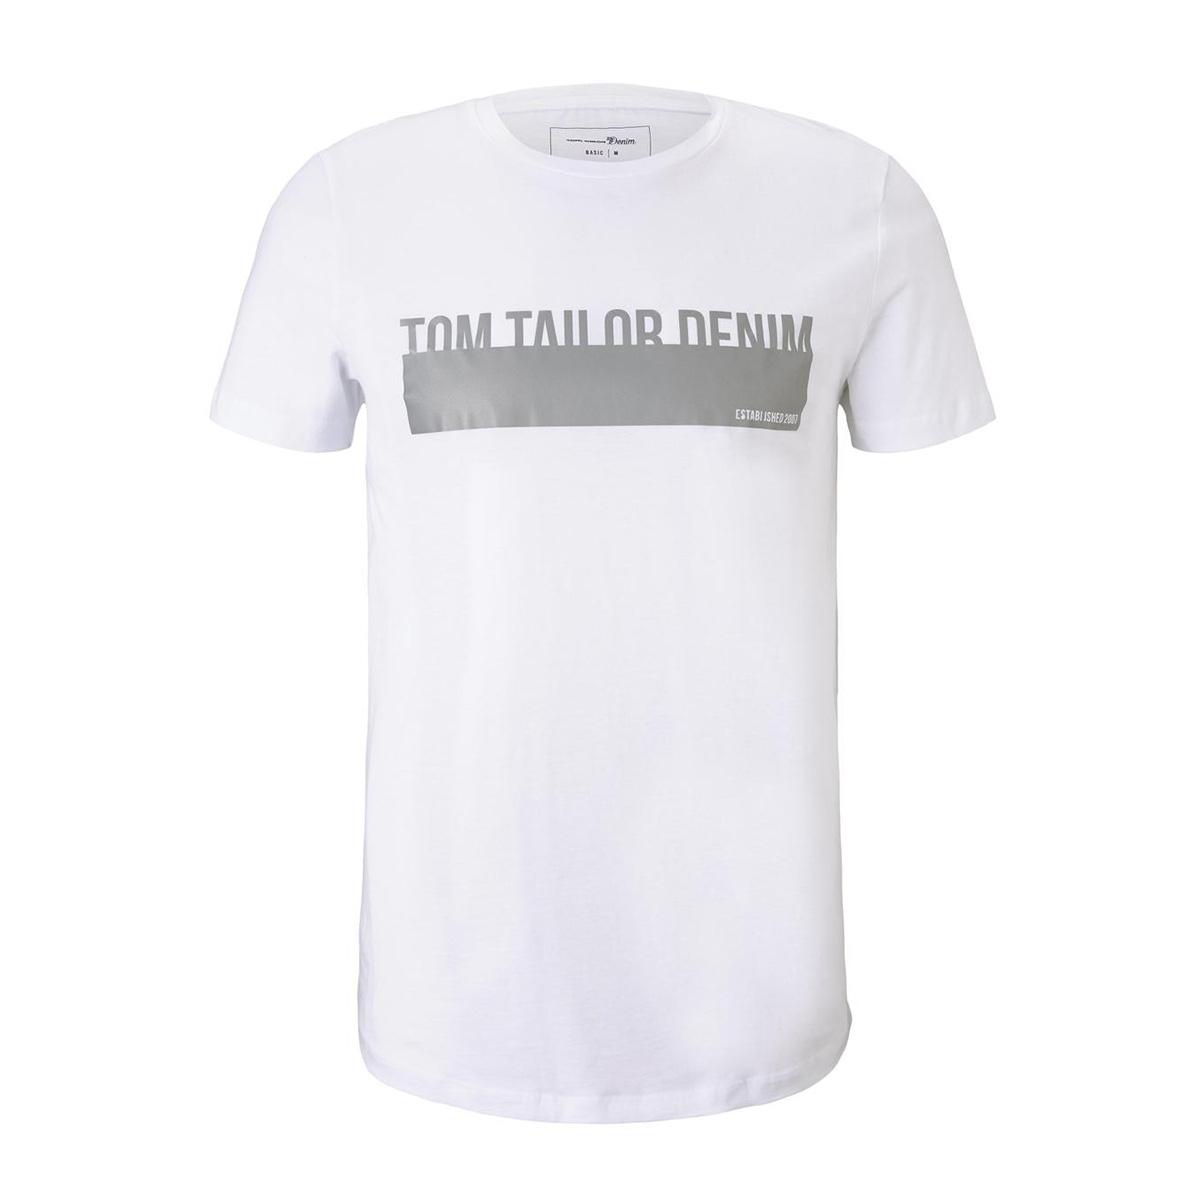 t shirt met reflecterende print 1015661xx12 tom tailor t-shirt 20000